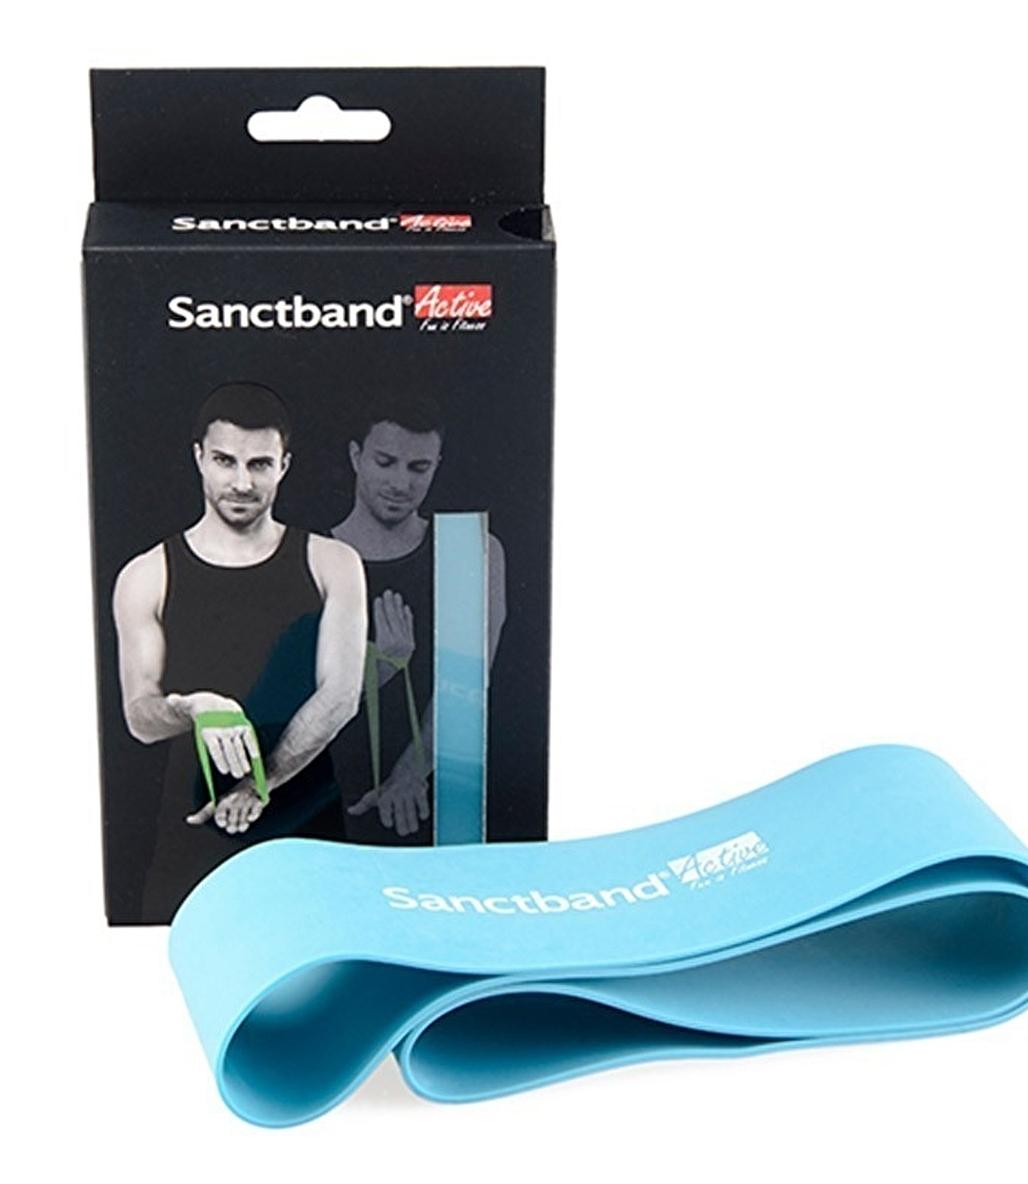 Sanctband Active Loop Band Direnç Lastiği Sert